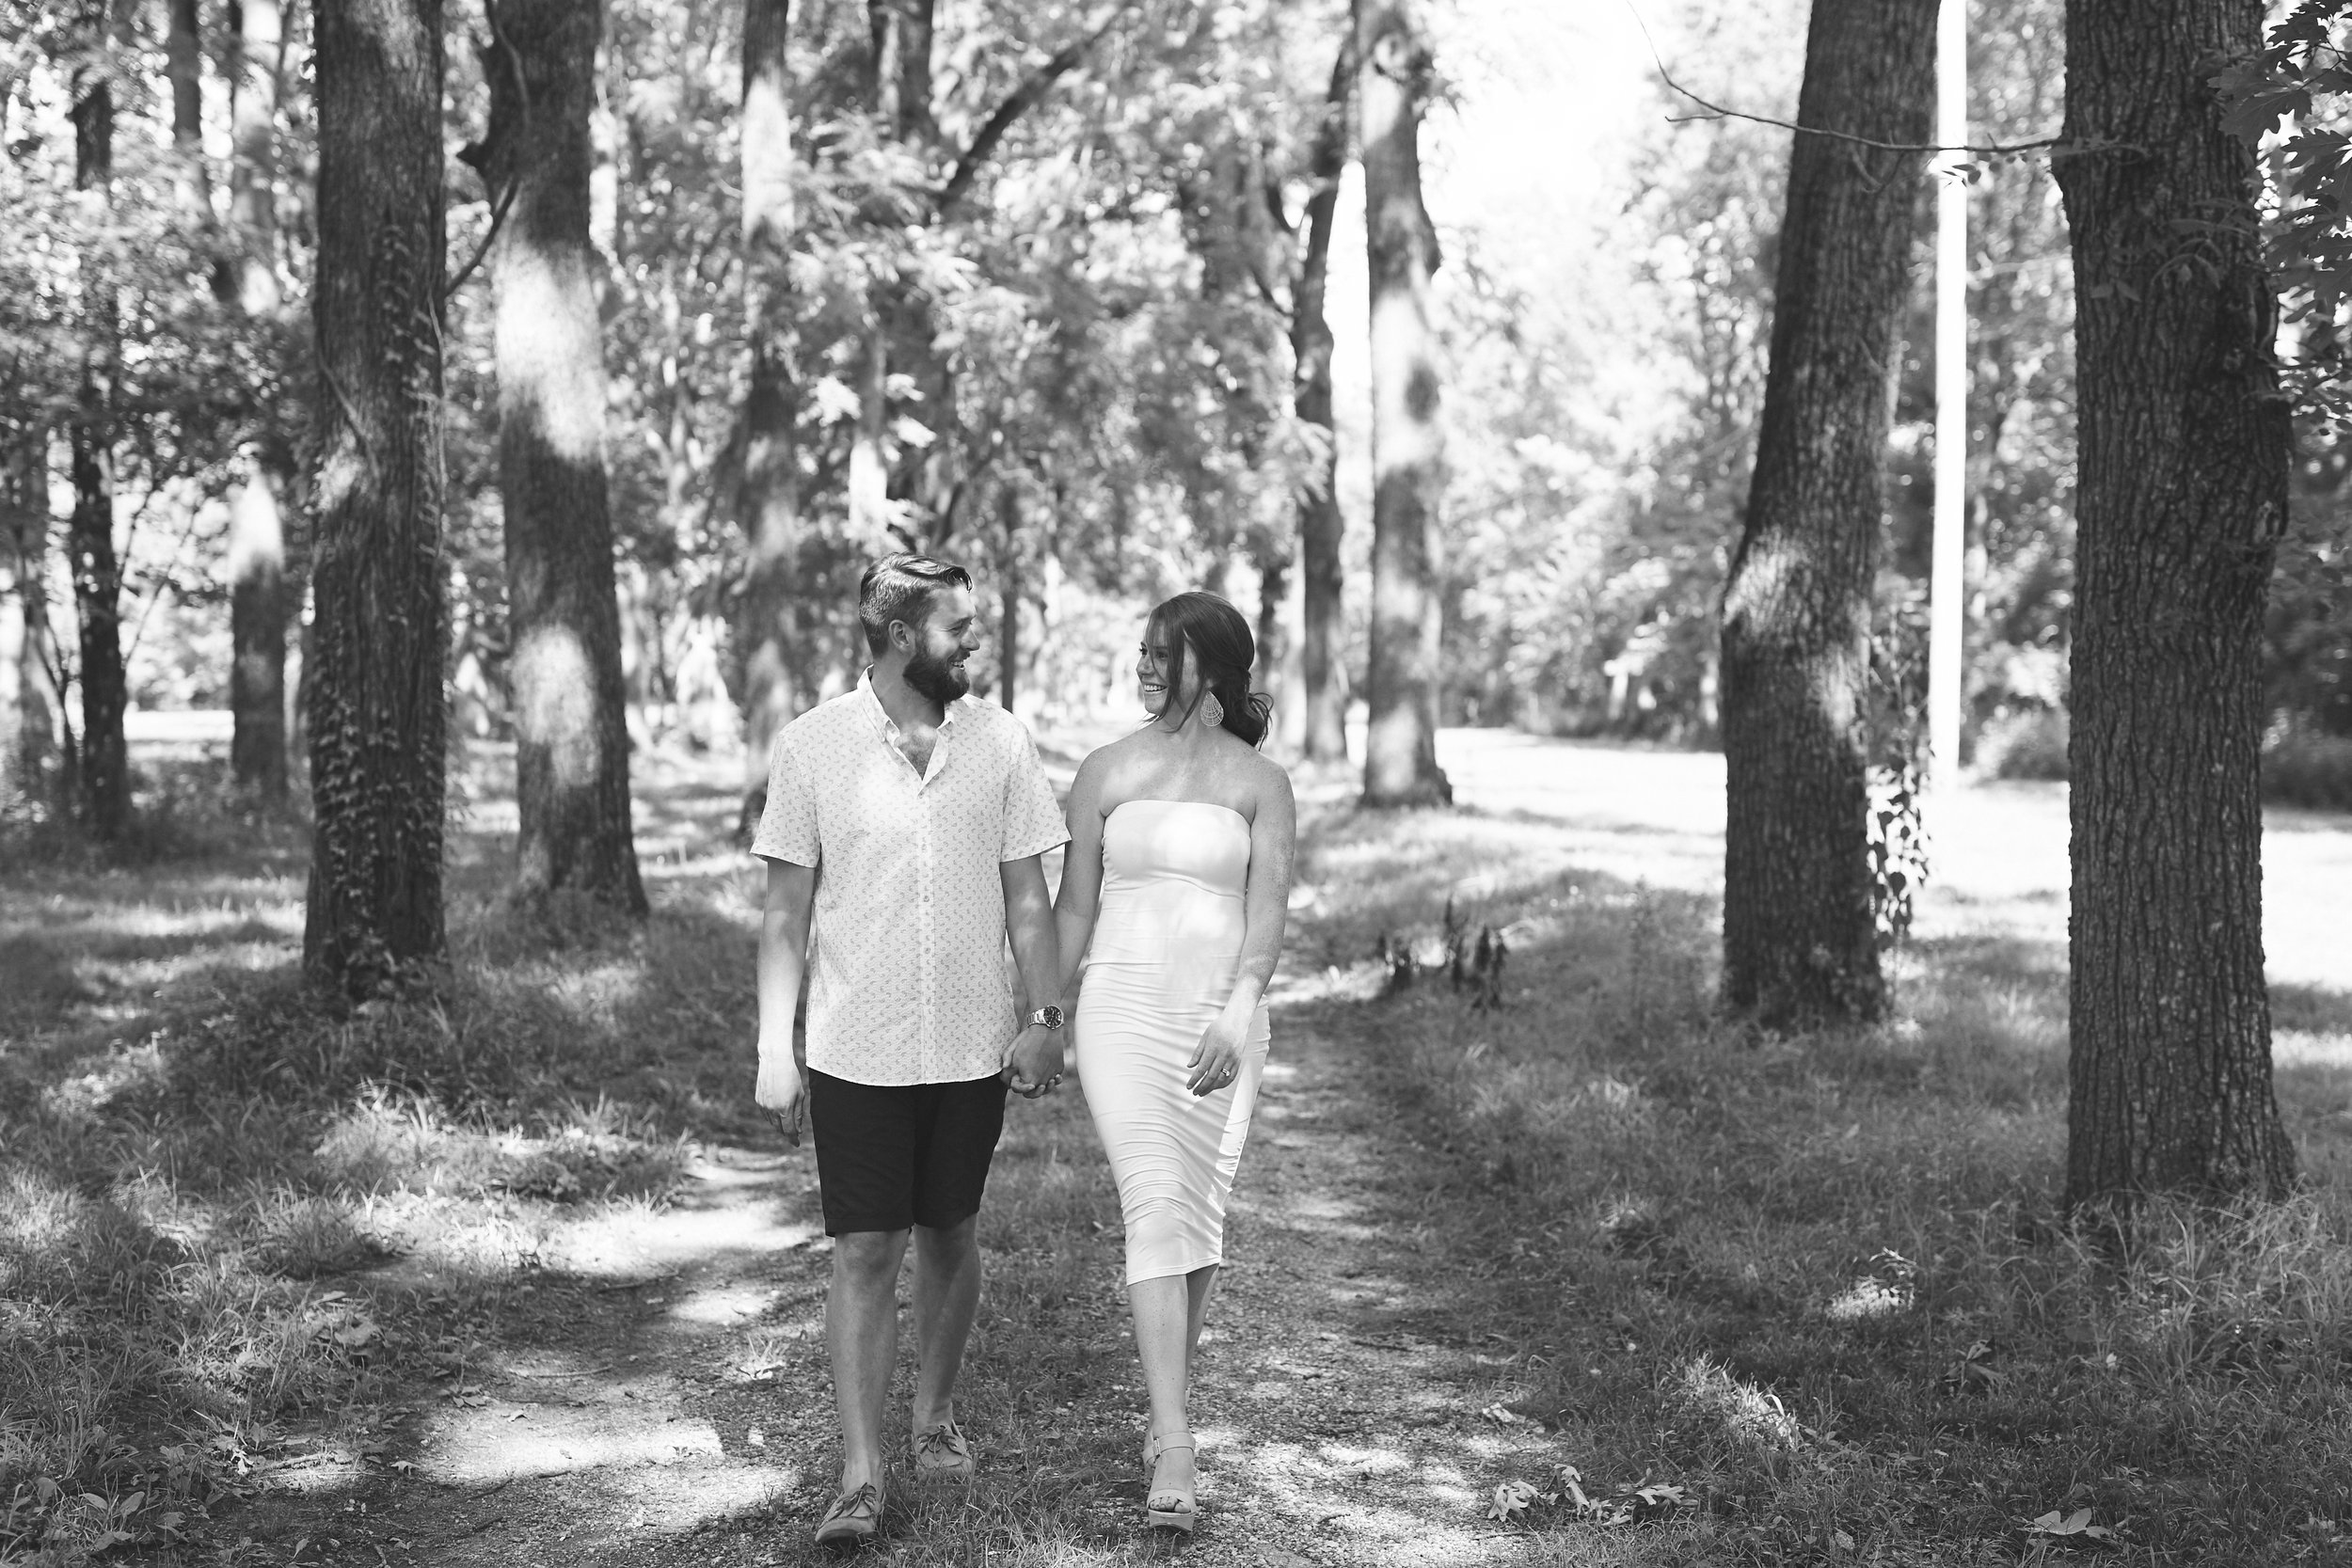 Ashley & David - benromangphoto - 6I5A4797.jpg